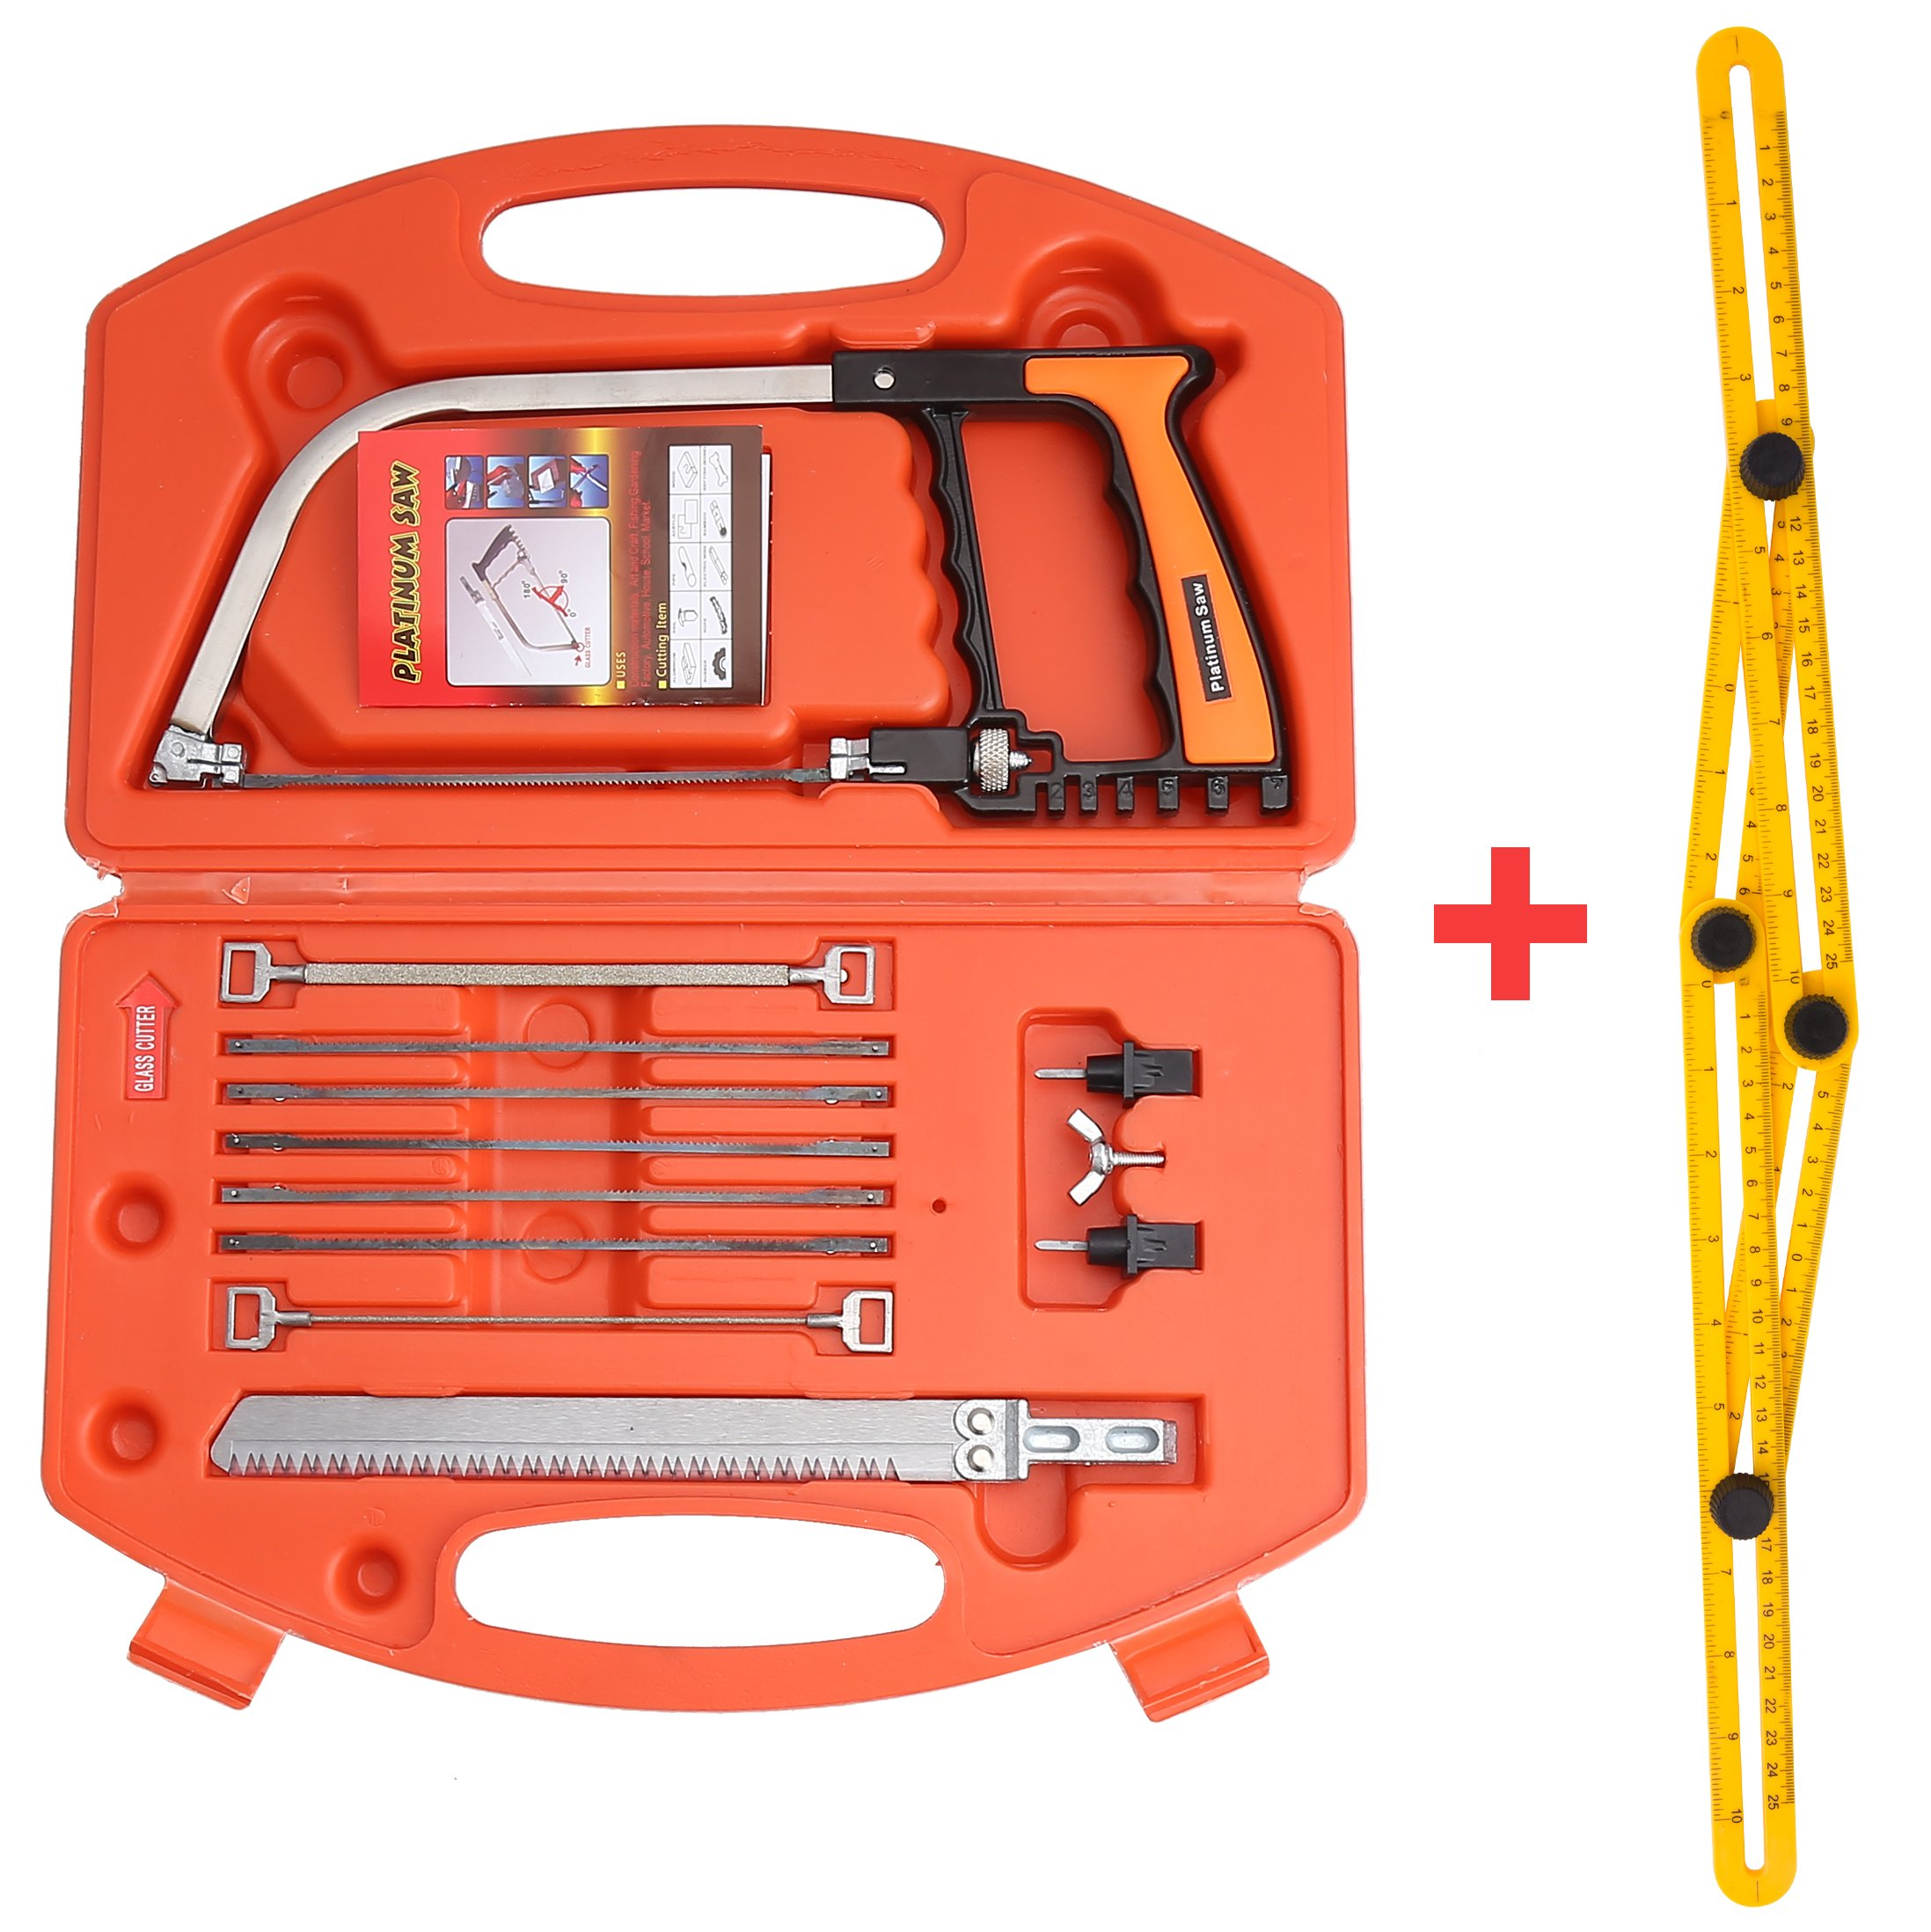 Handsaws Set, Four Fold Ruler, Multifunction Bow Saw +Angle Measuring Ruler for Engineer Handymen Builders Craftsmen by SILIVN